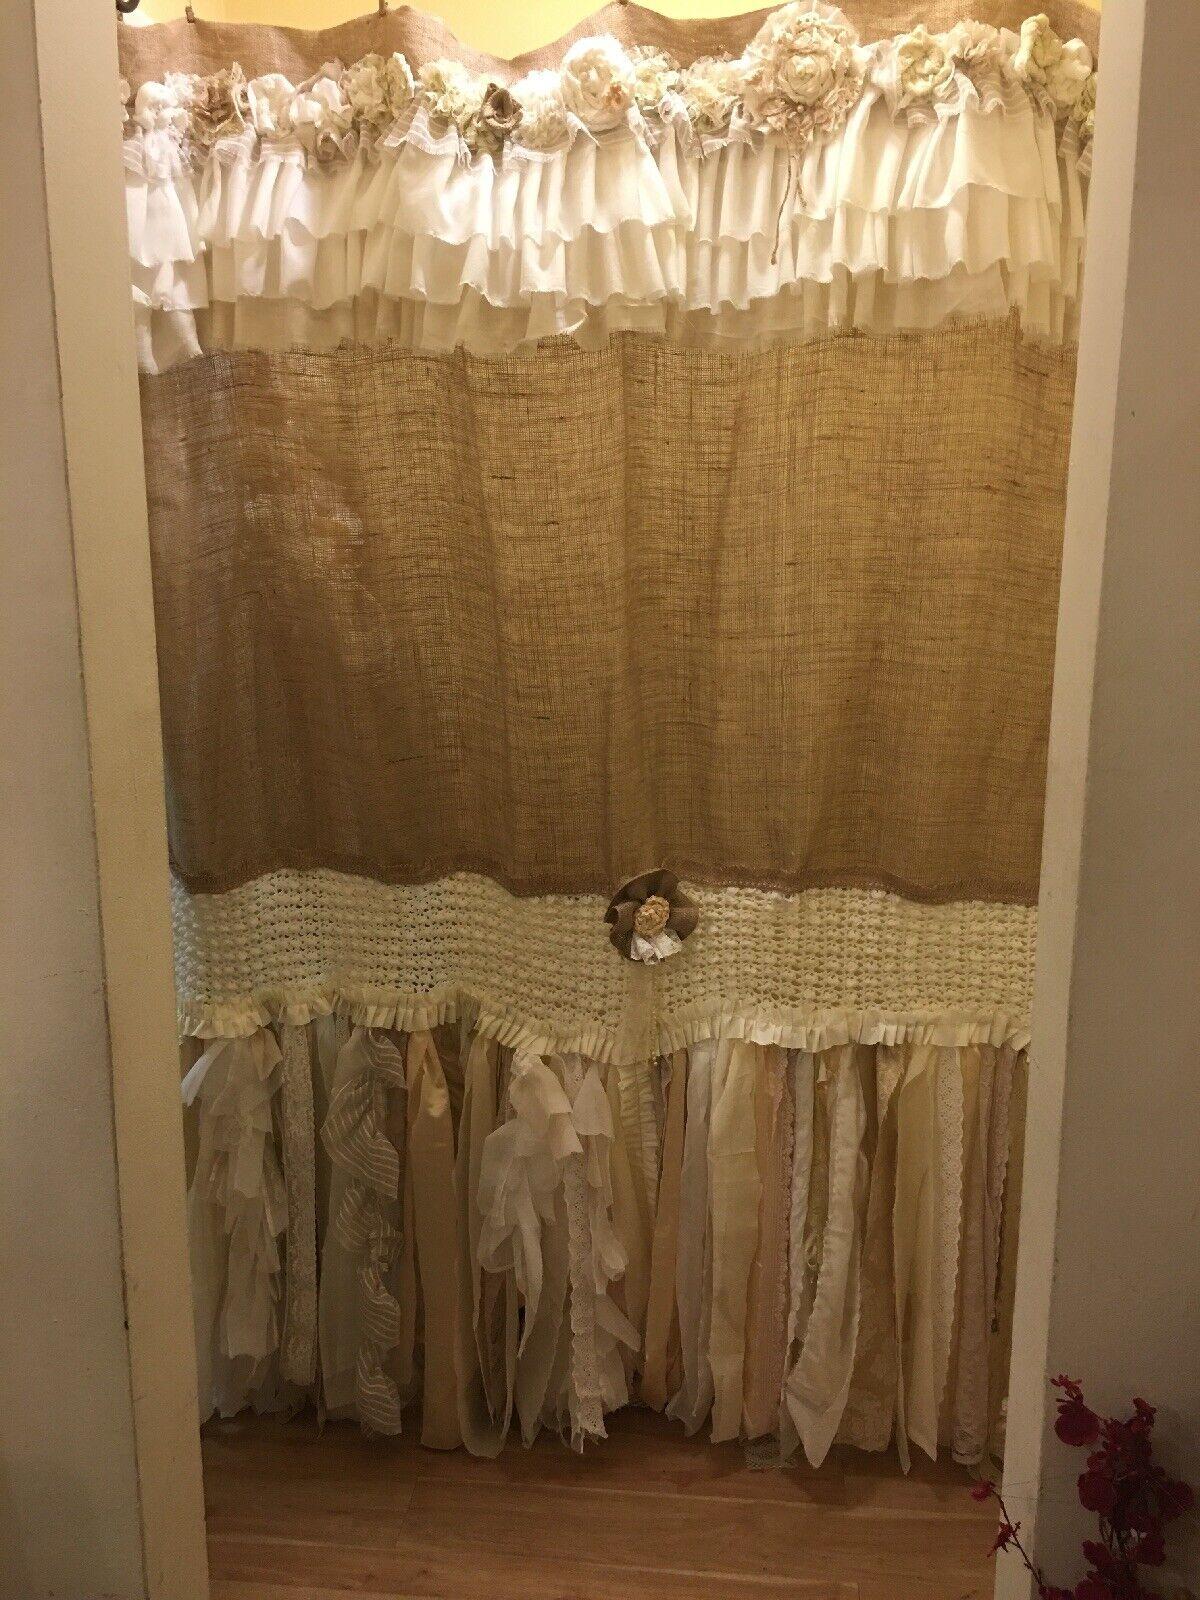 Bathroom Supplies Accessories Custom French Shabby Rustic Chic Burlap Shower Curtain Valance Lace Ruffle White Amusic Es